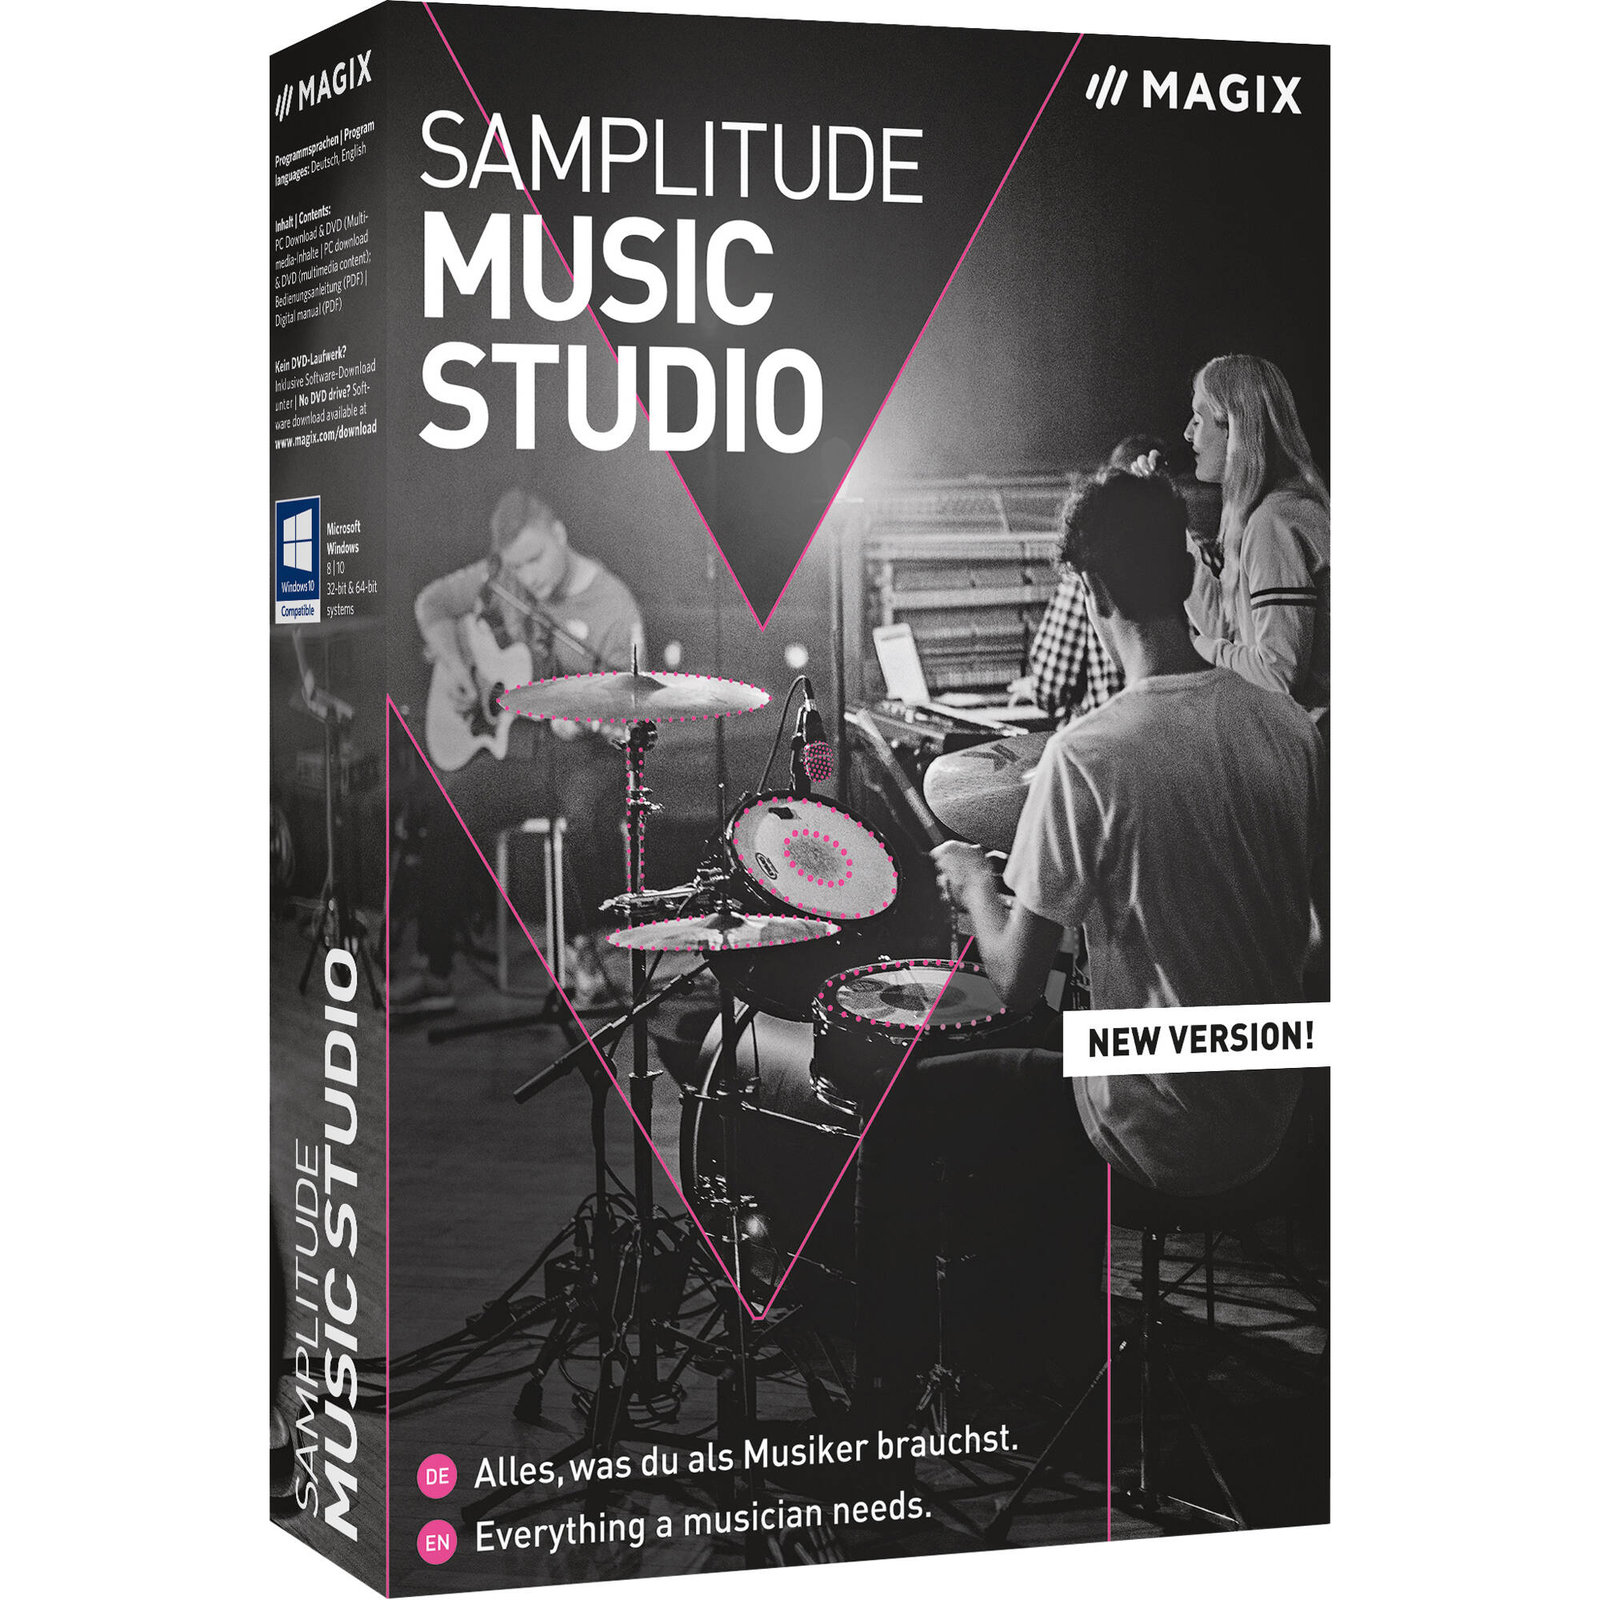 Poster for MAGIX Samplitude Music Studio